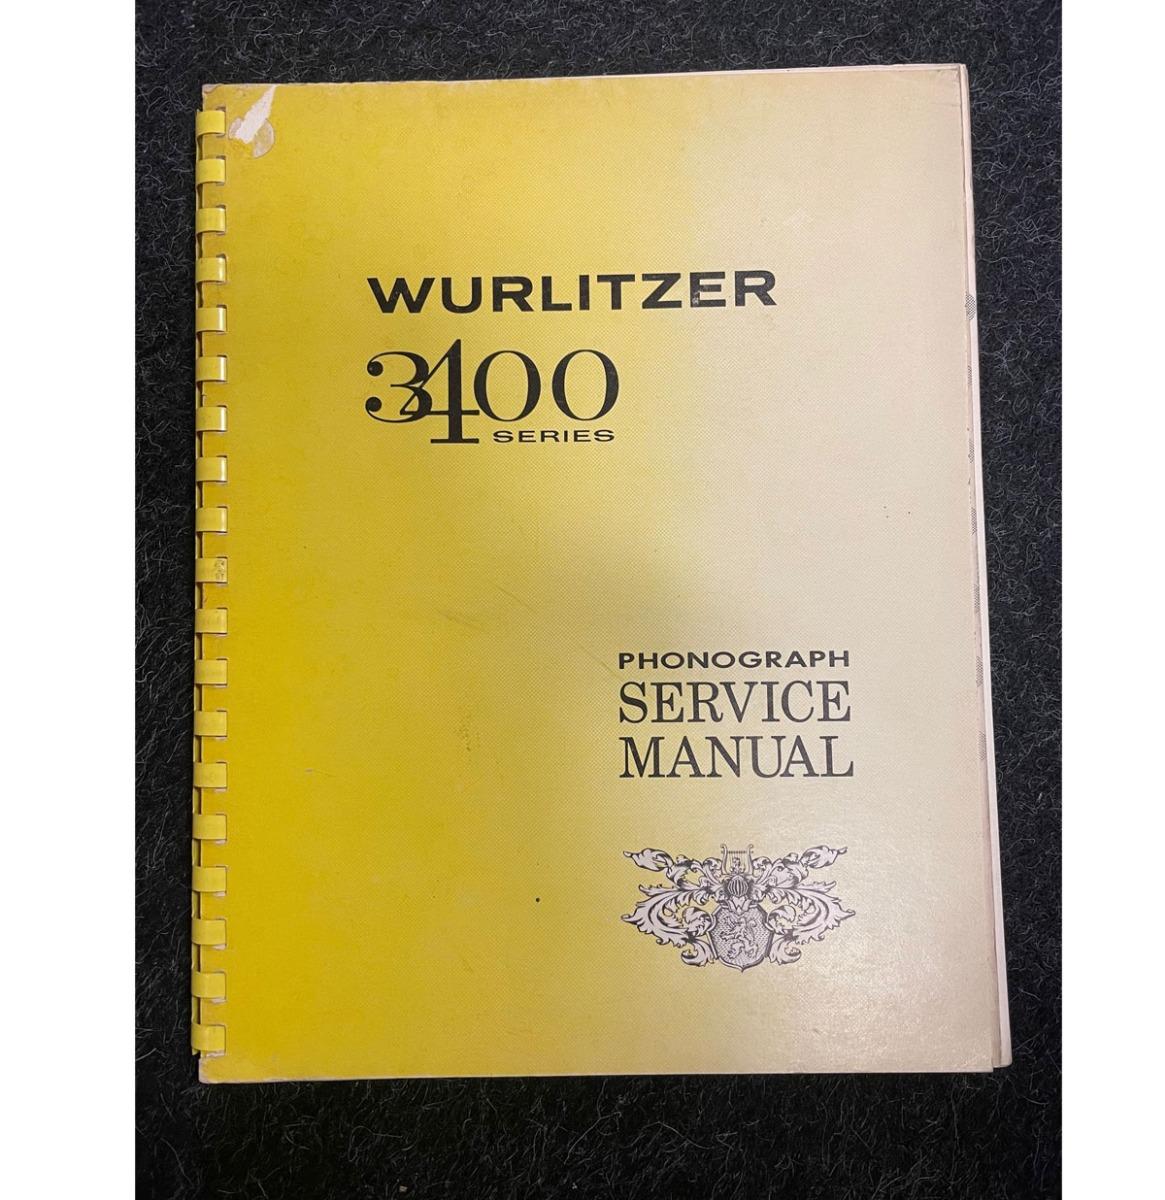 Wurlitzer 3400 manual original